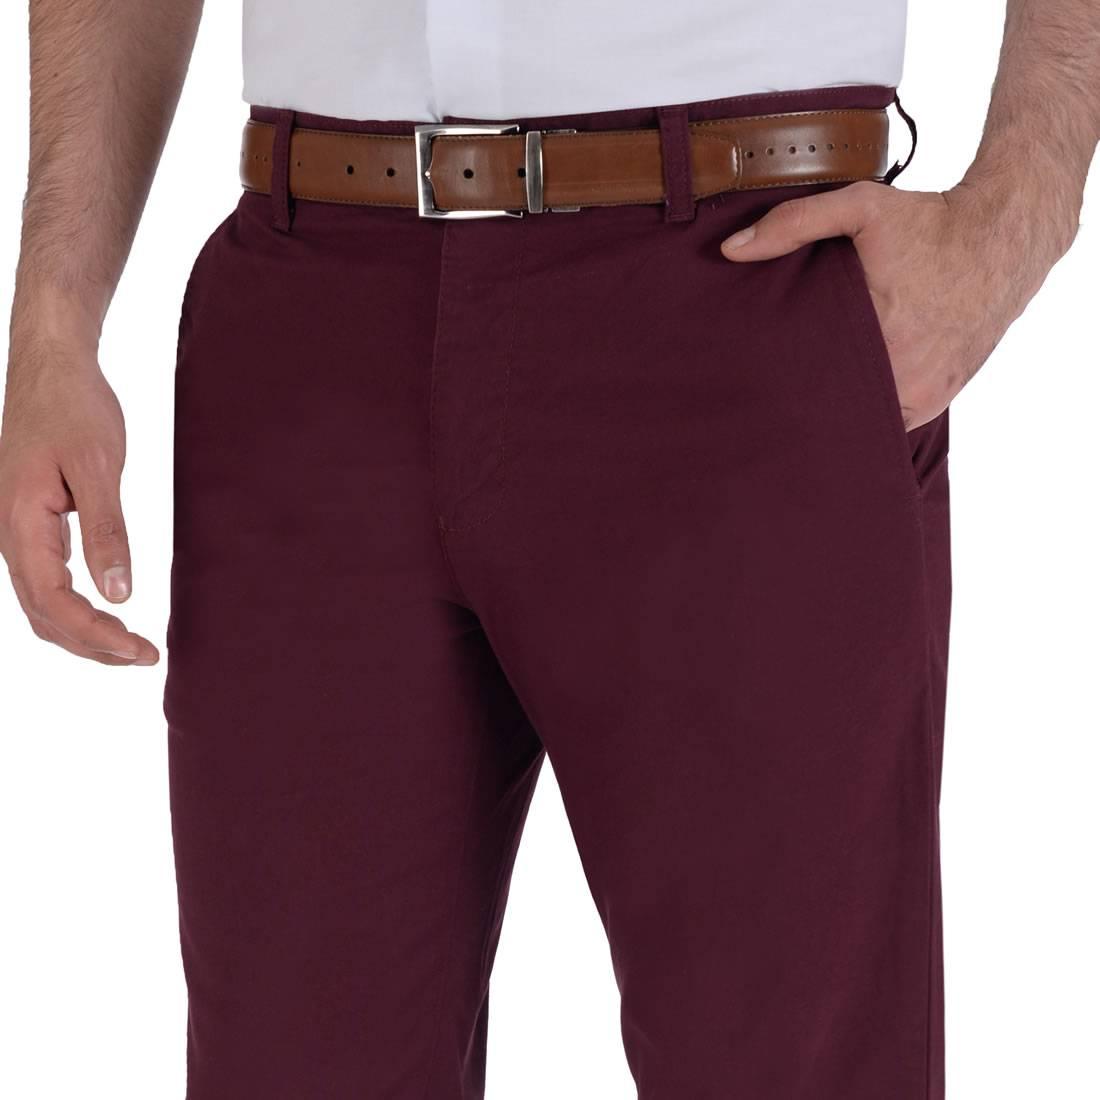 010811077434-03-Pantalon-Casual-Sin-Pinzas-Classic-Fit-Con-Elastano-Vino-yale